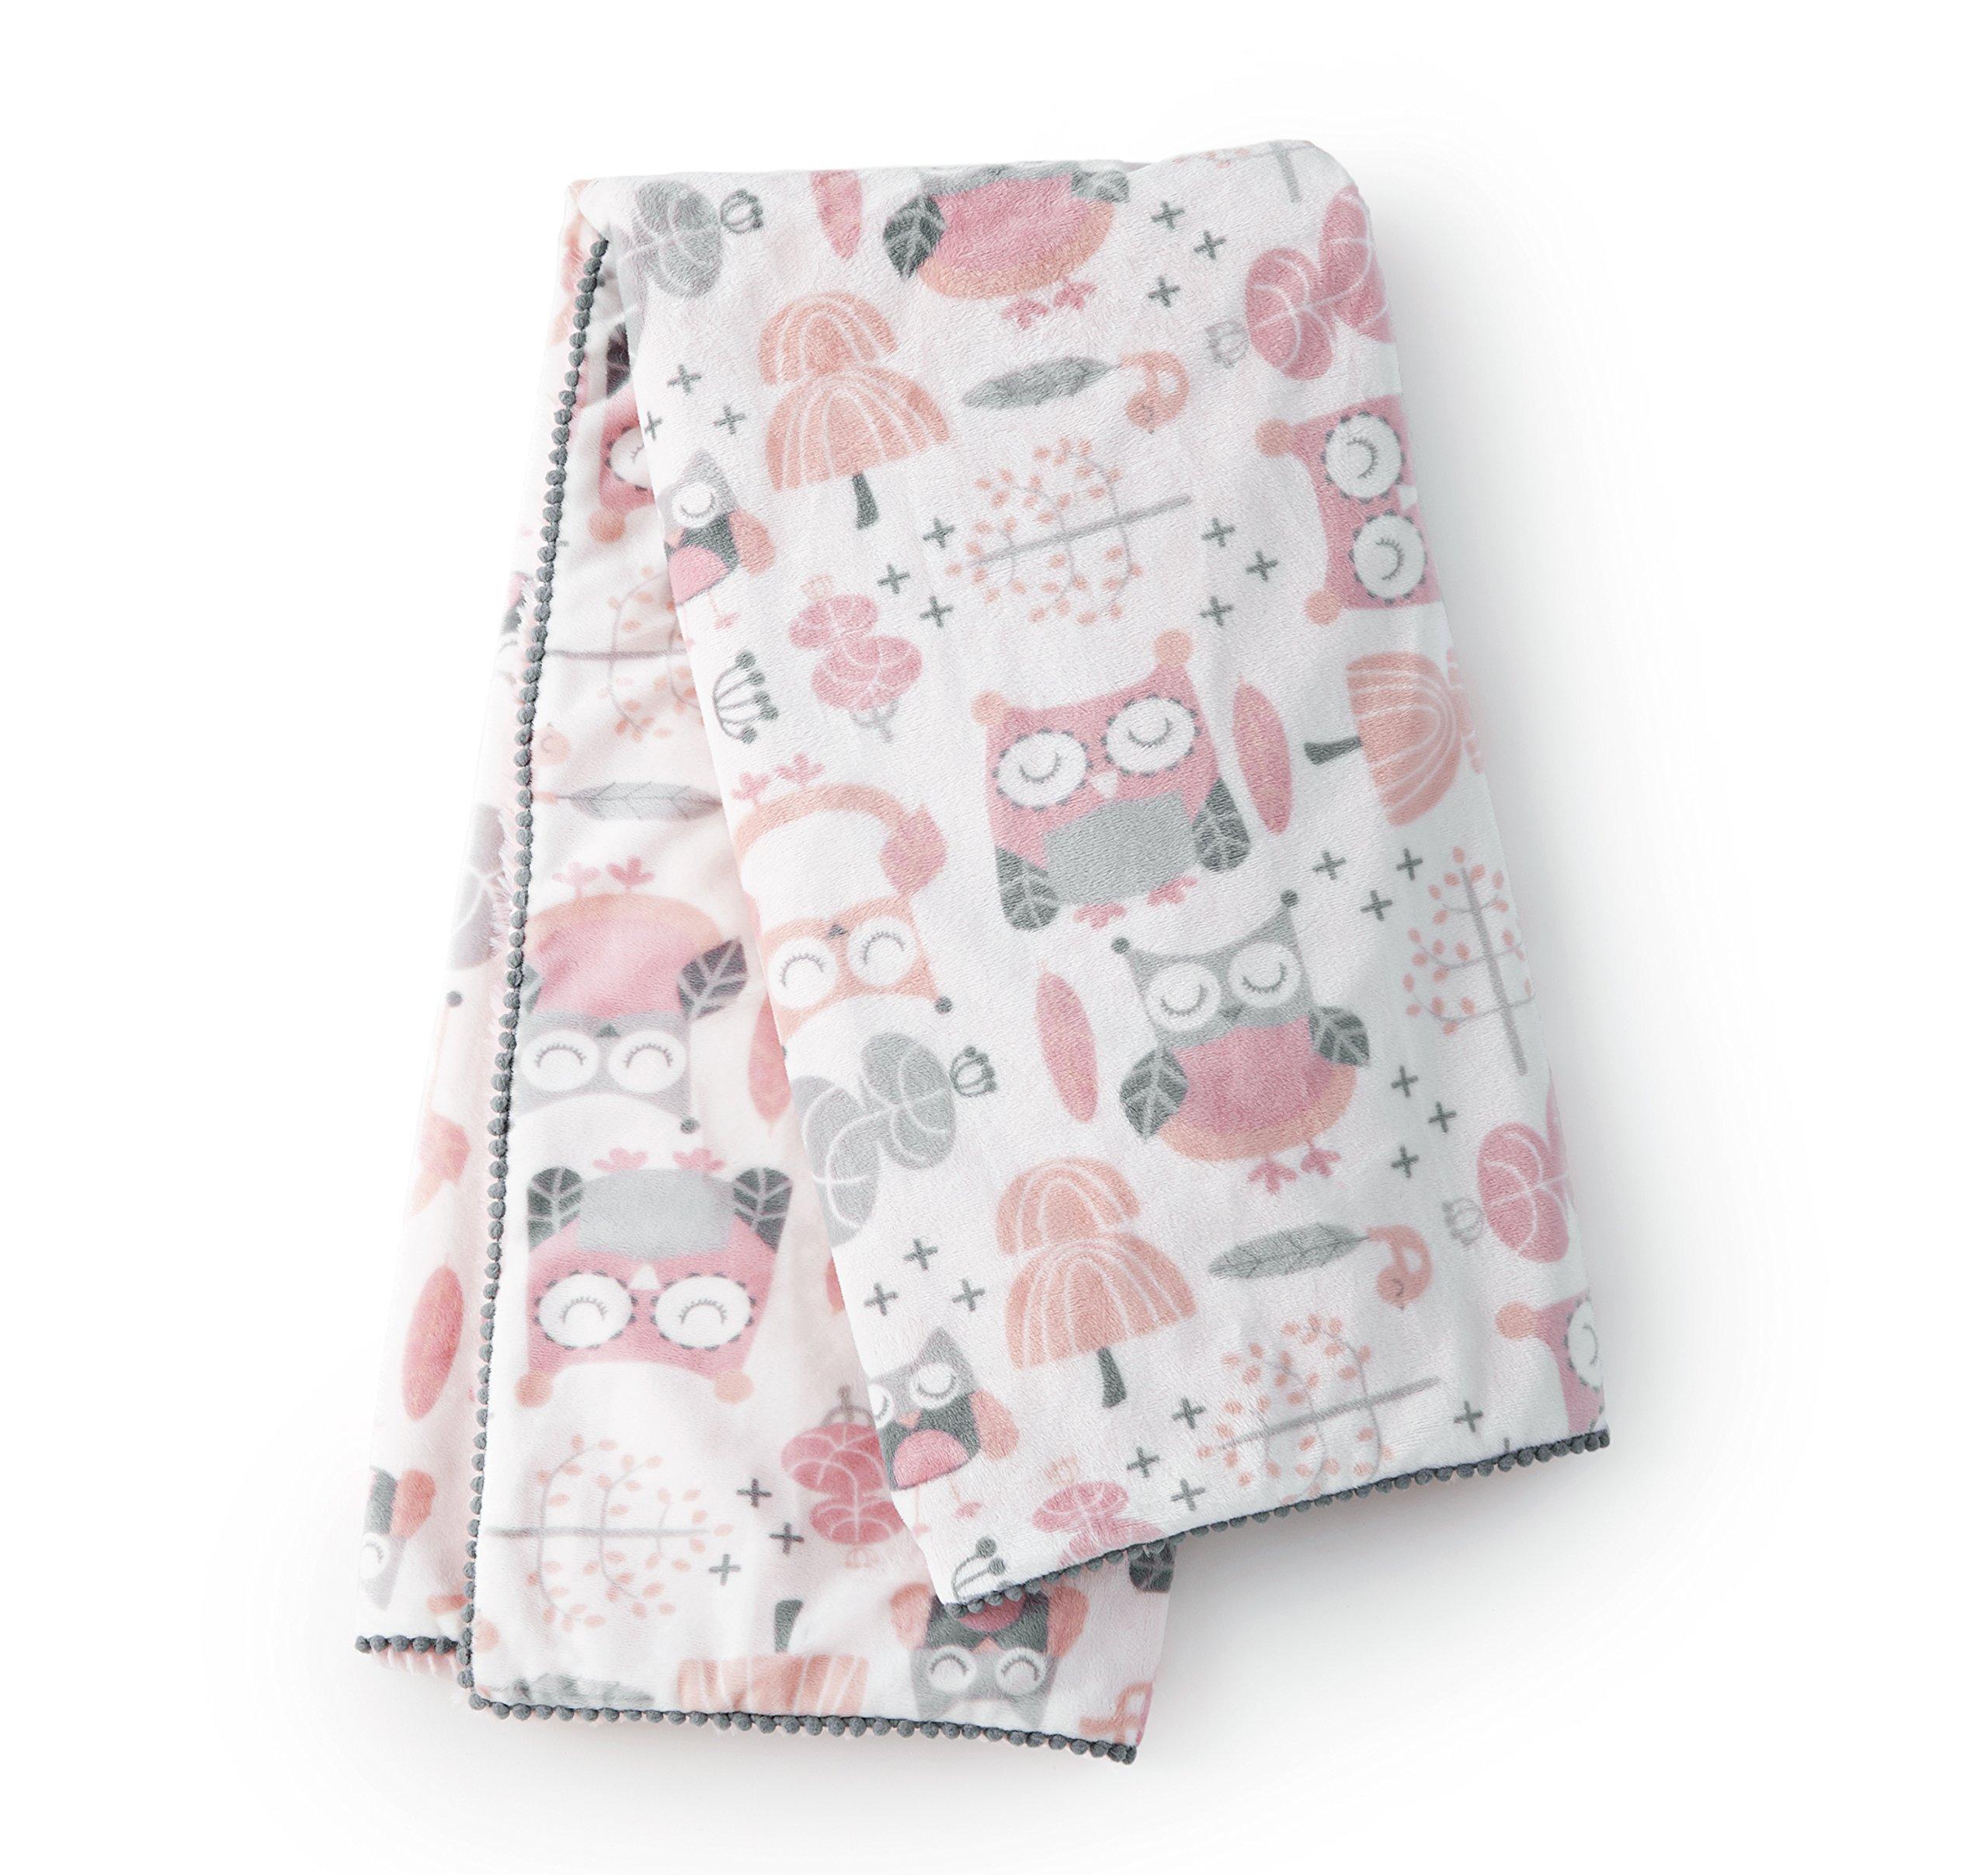 Levtex Home Baby Night Owl Plush Blanket, Pink